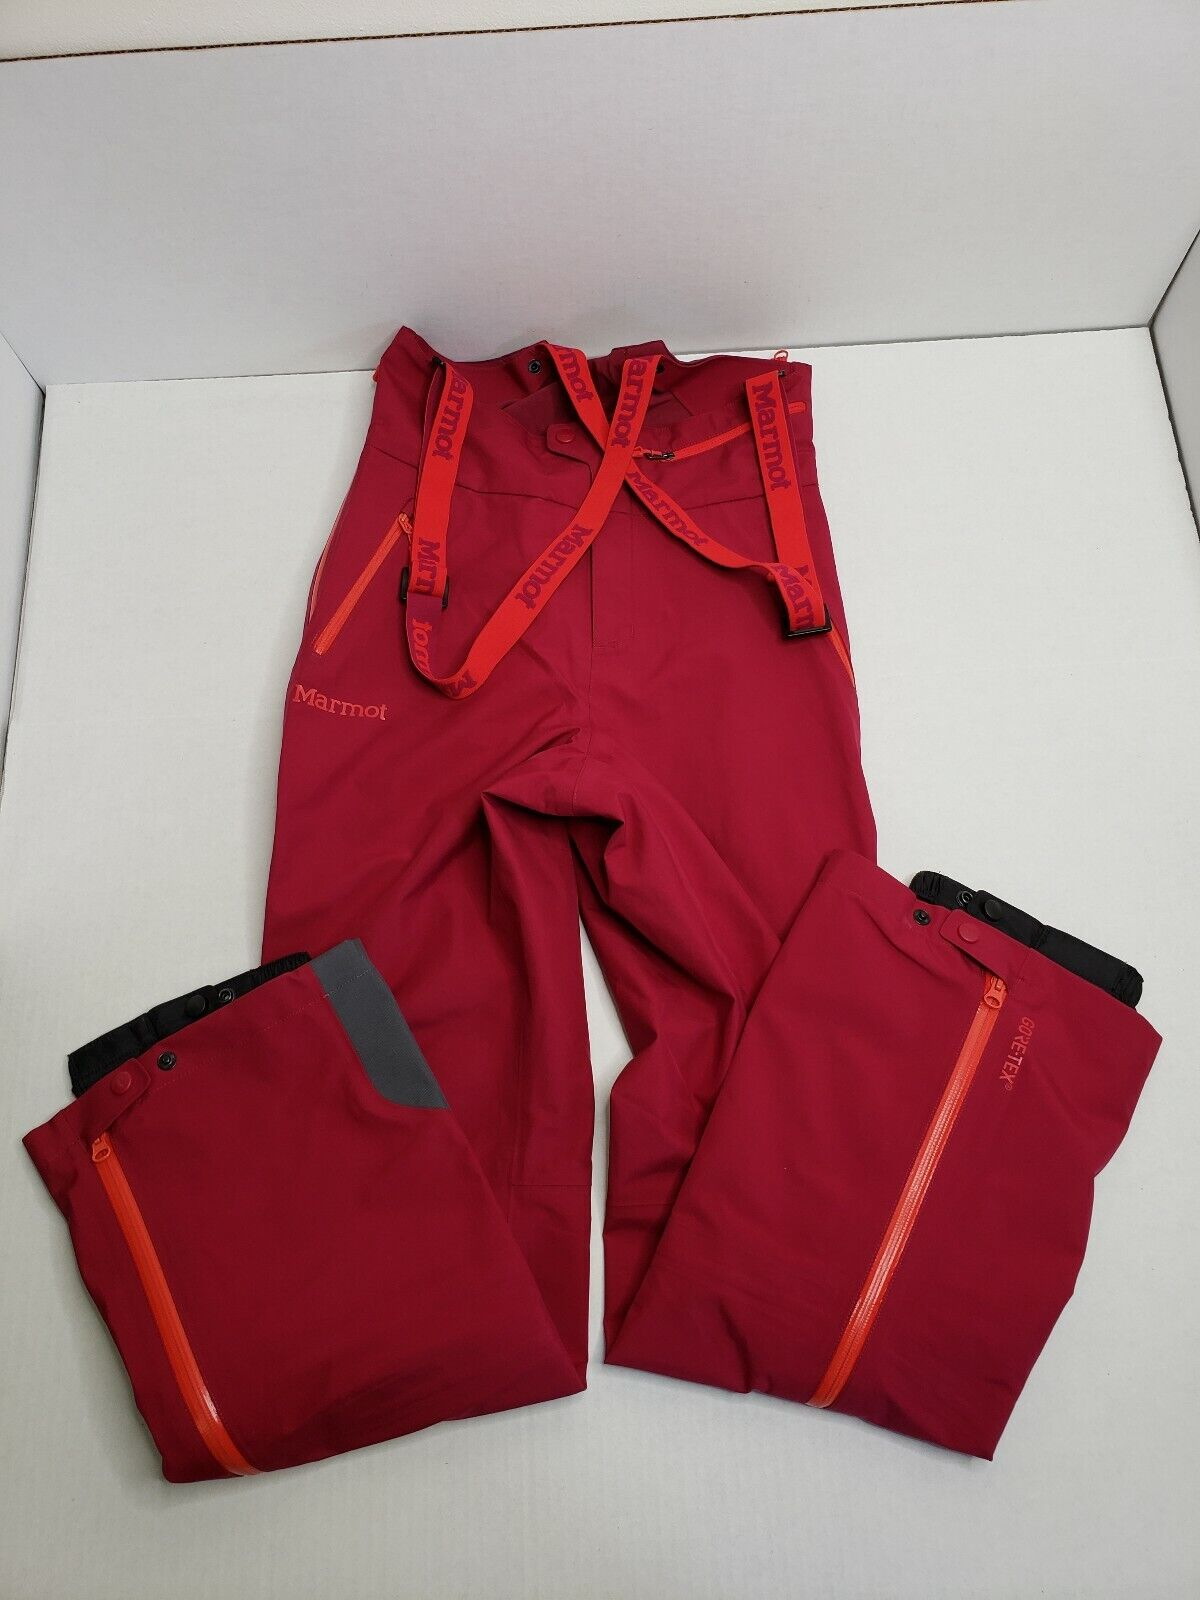 Marmot Women's Spire Bib Snow Pants 35070 Small Red Dahlia NWT